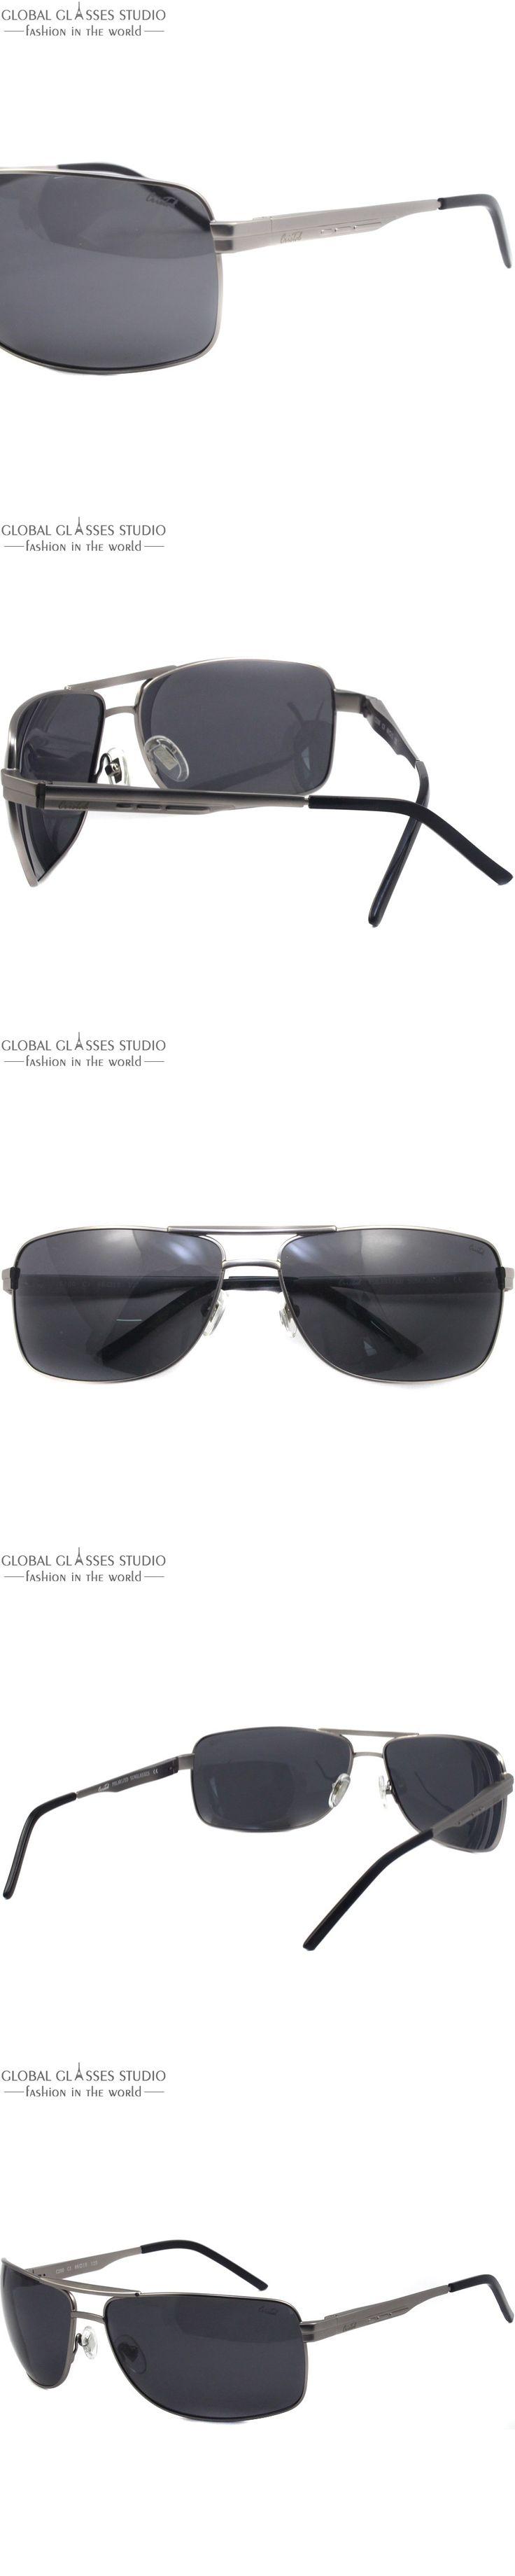 New High Quality Men Stainless Steel Spring Hinge Gray clean lens Sunglasses C200 C3